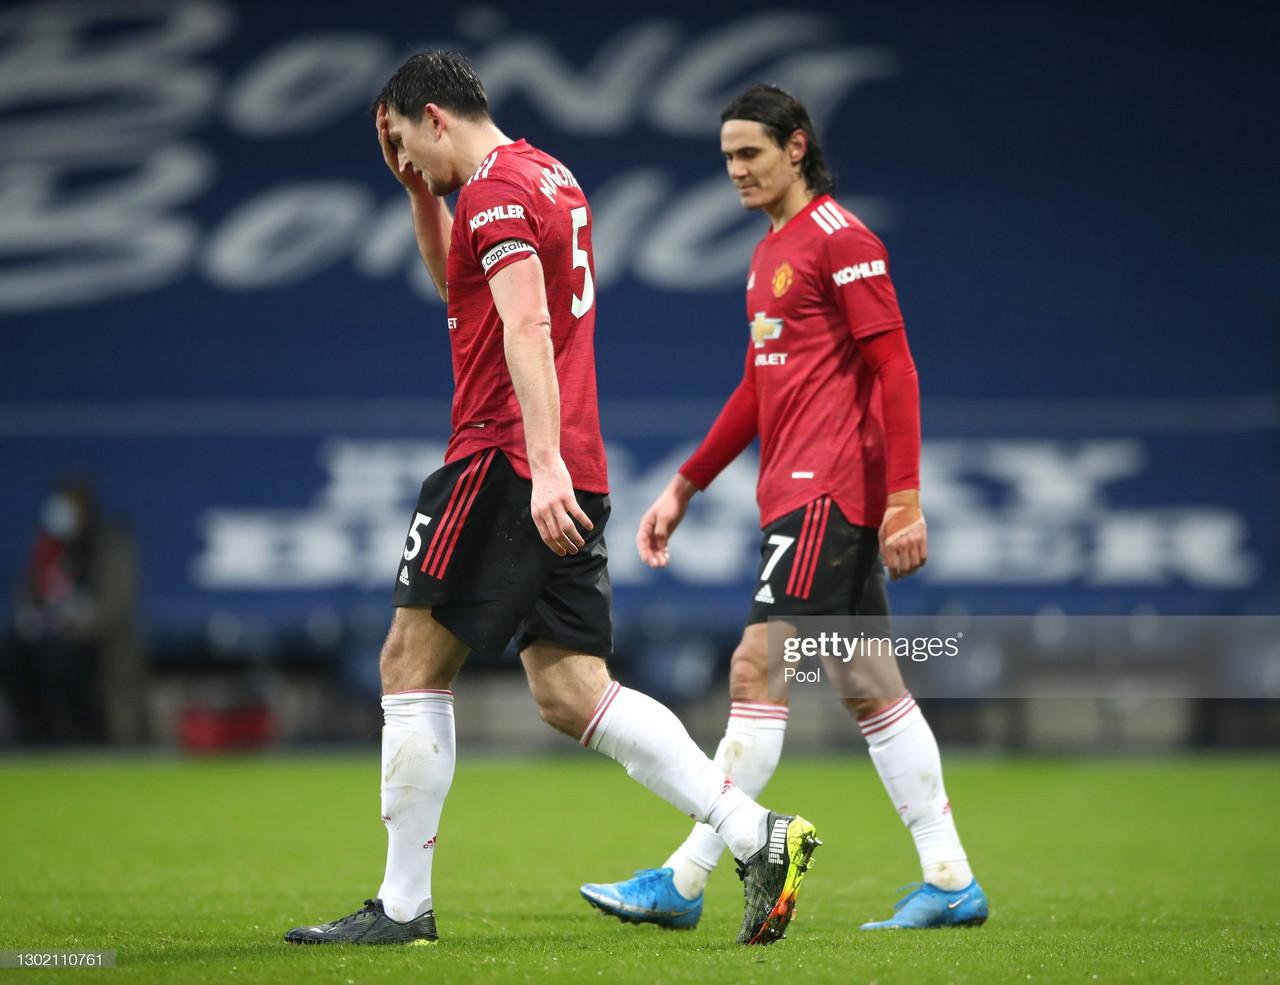 West Bromwich 1-1 Manchester United: Lacklustre Red Devils ratings